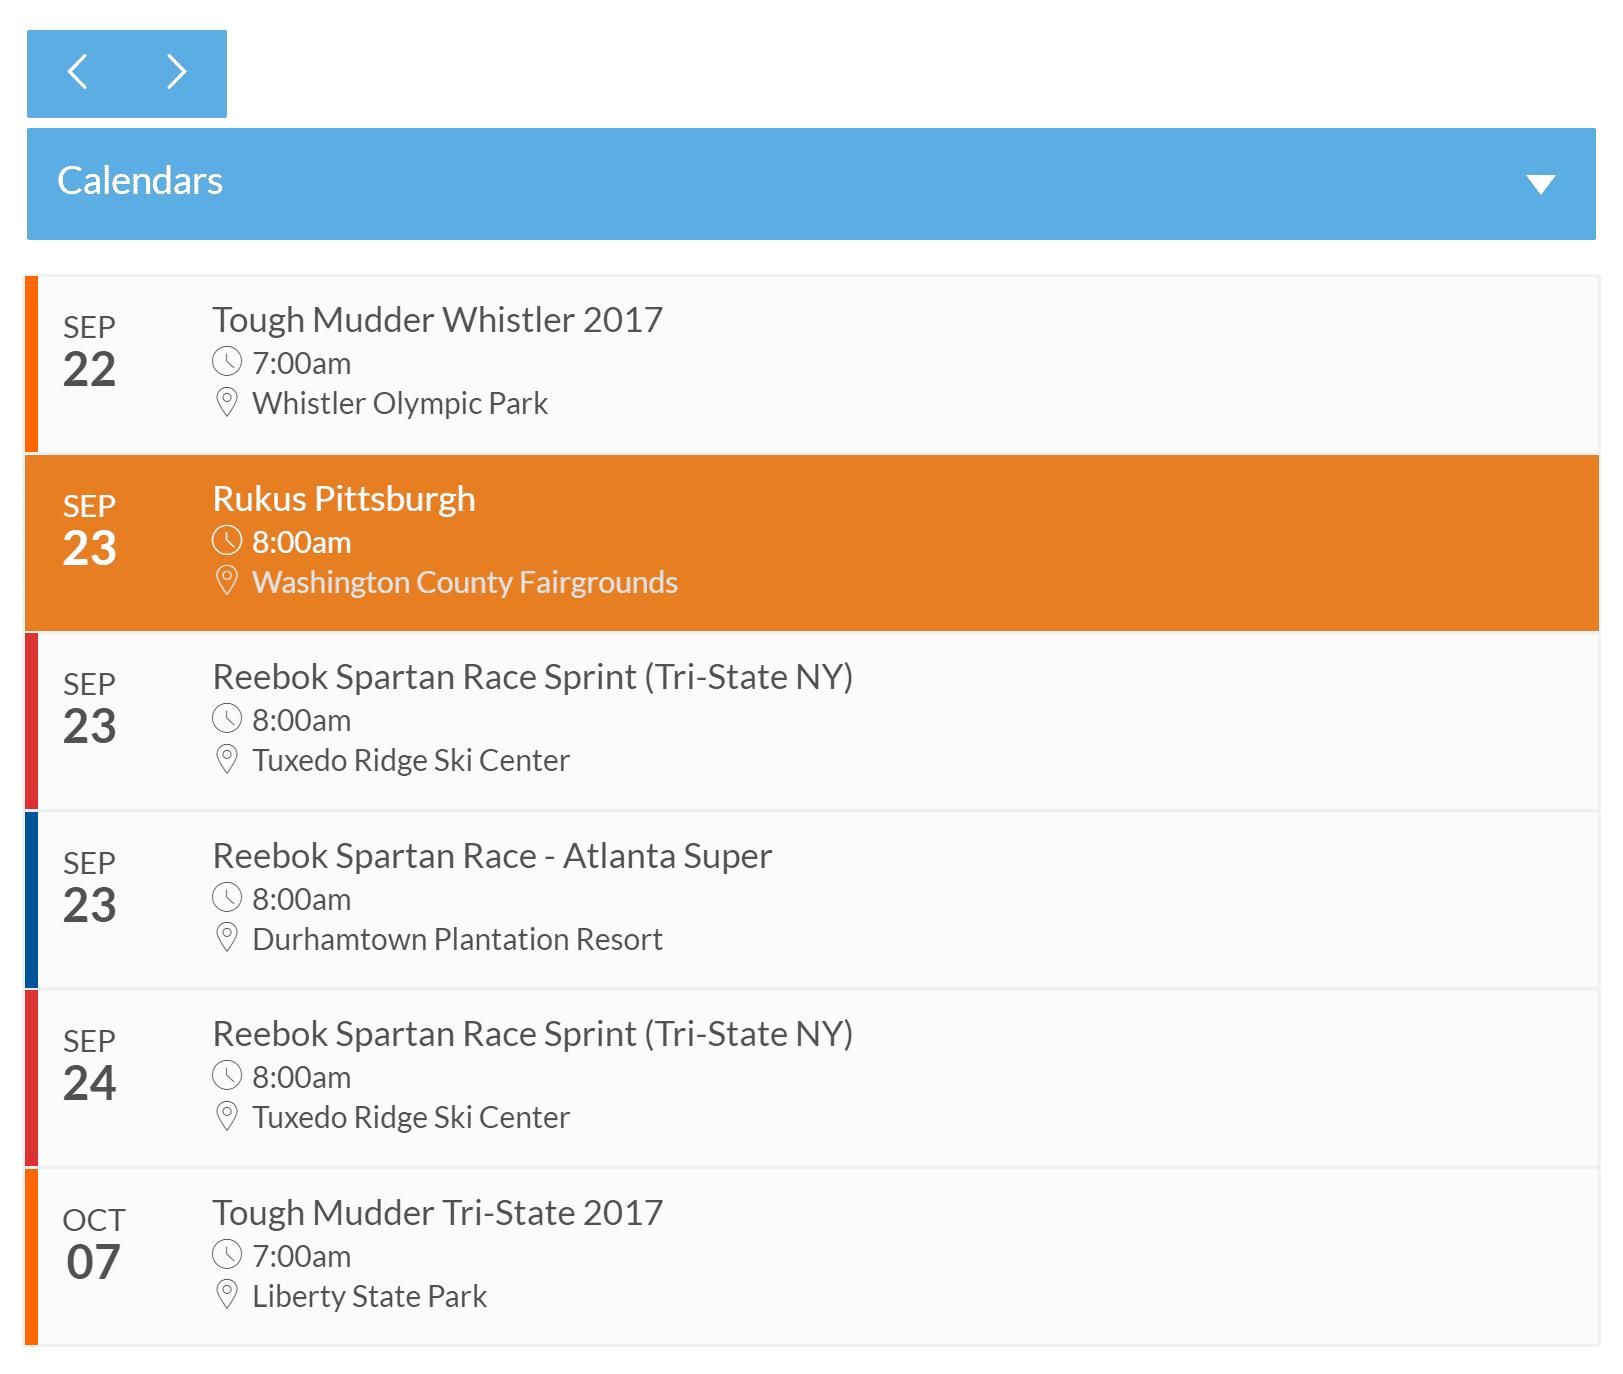 Accordion Schedule View